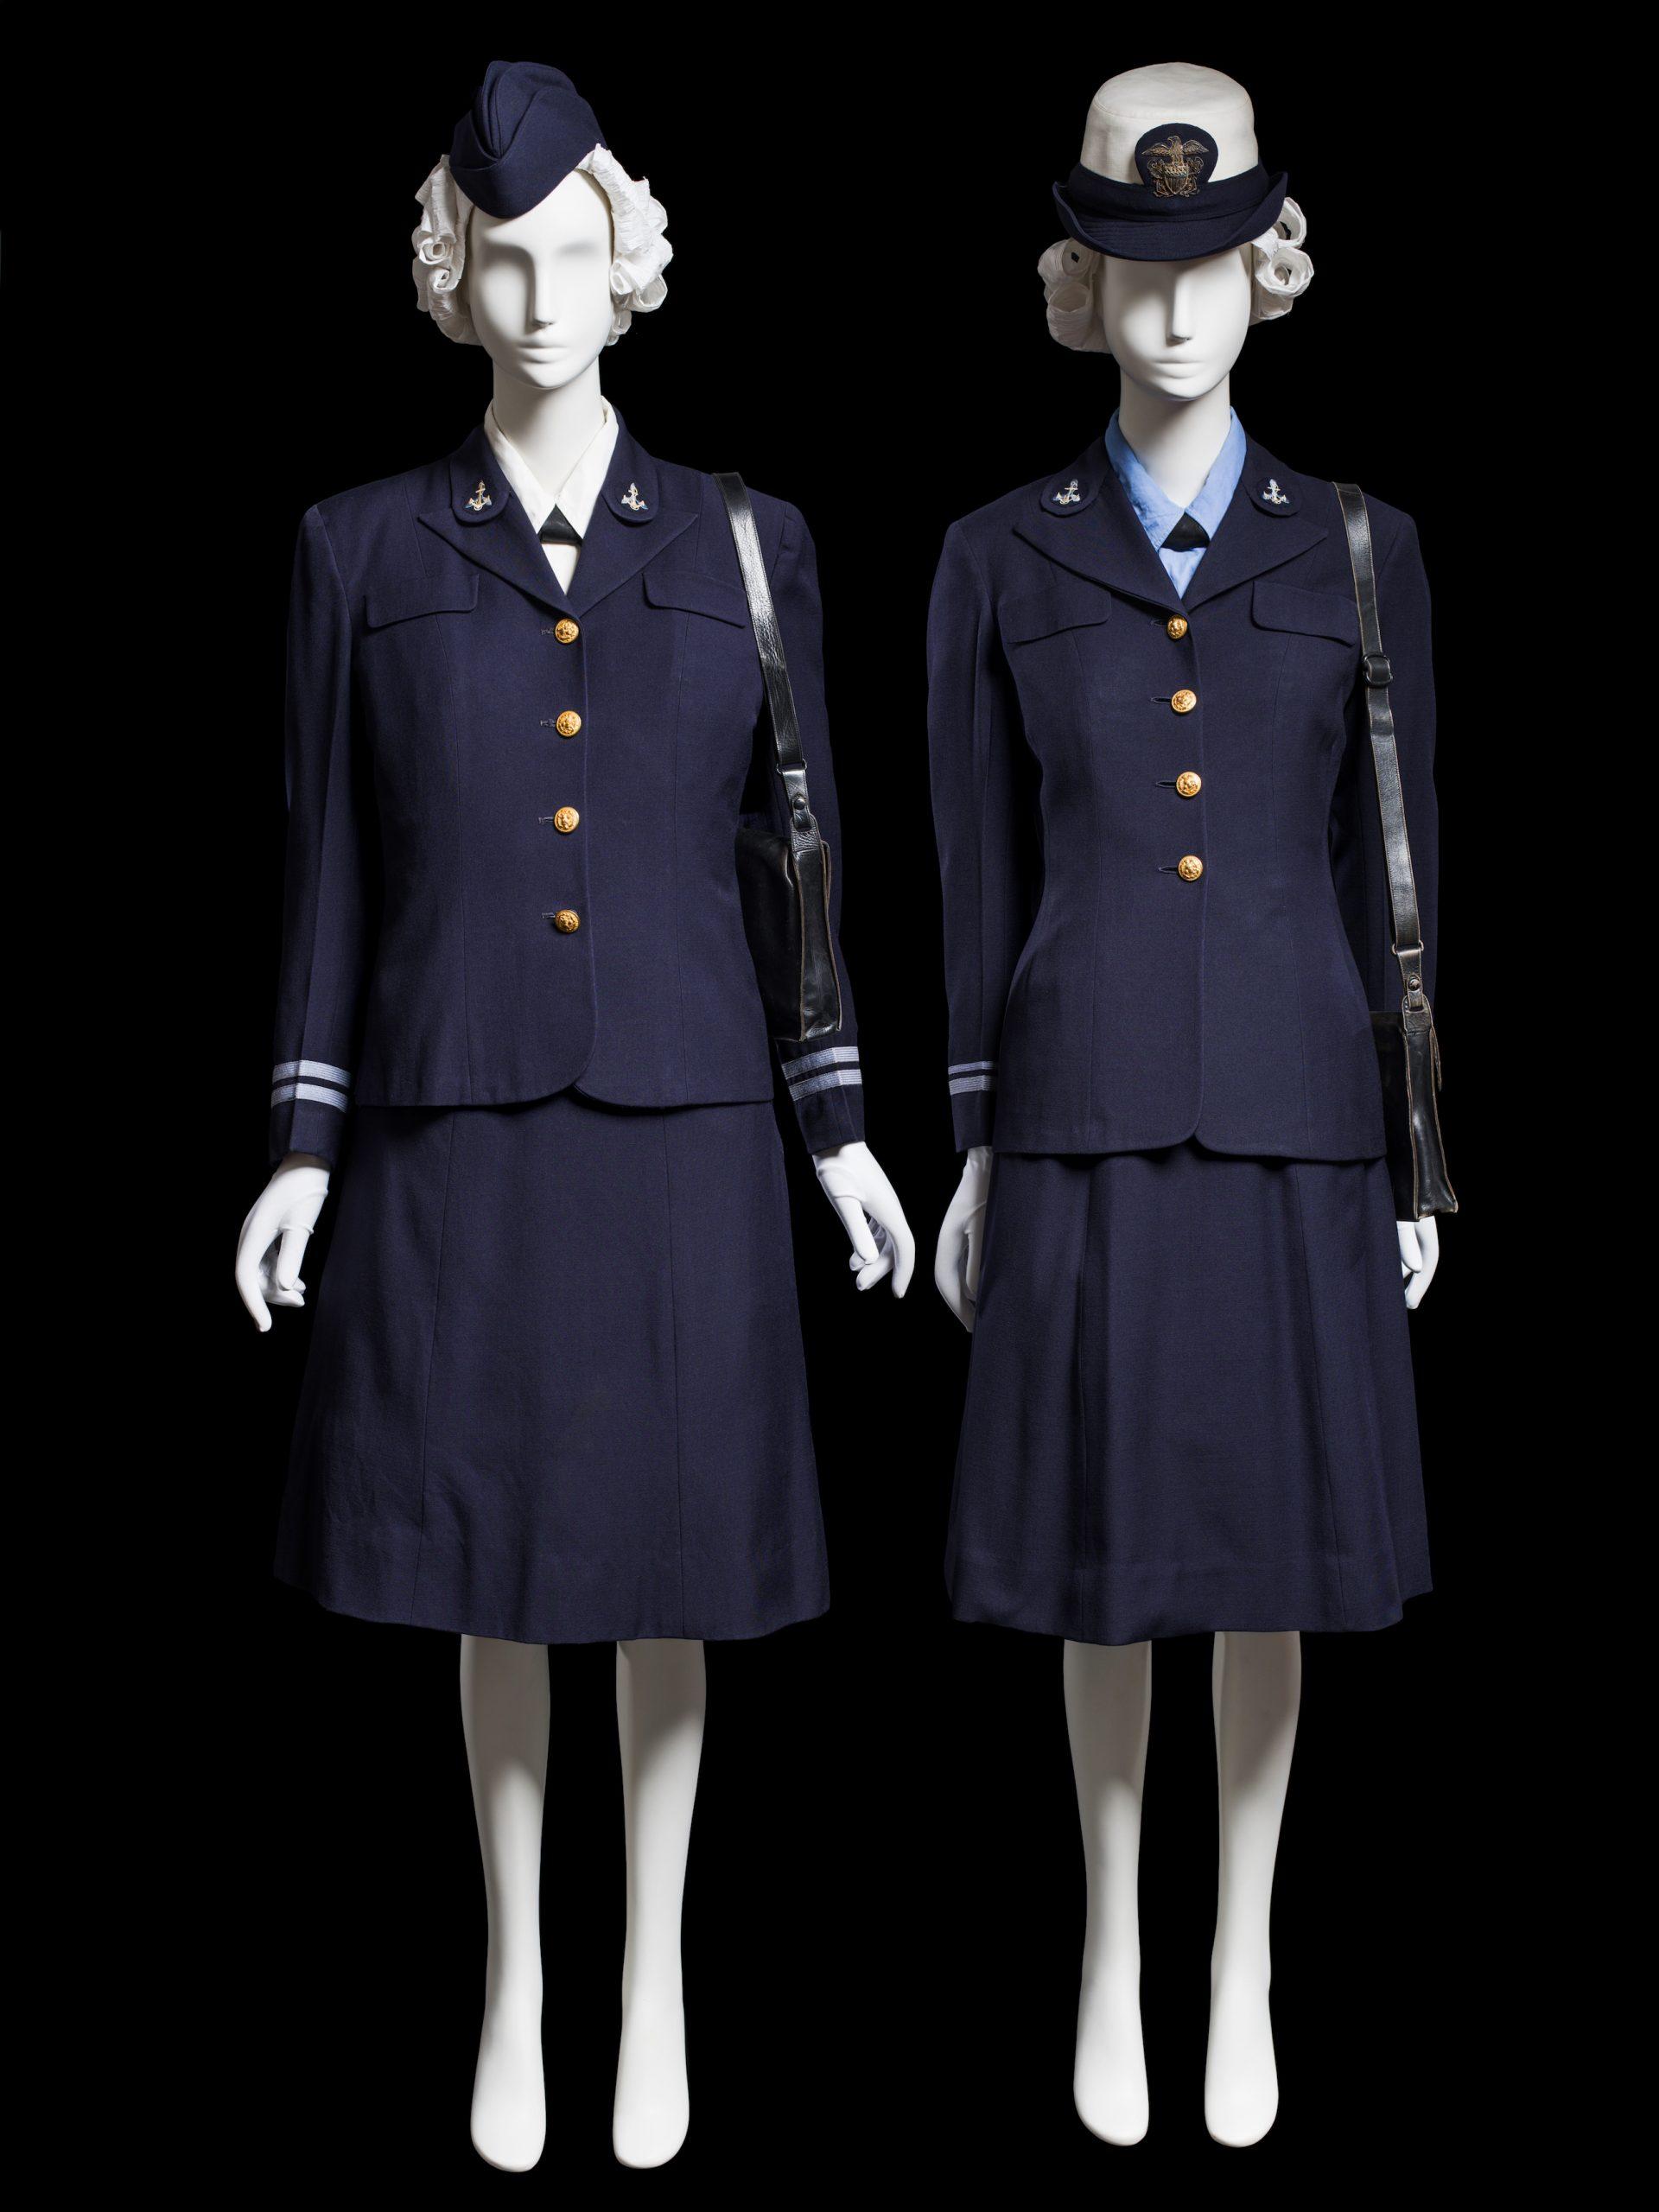 WAVES uniform, United States Naval Reserve, c. 1942